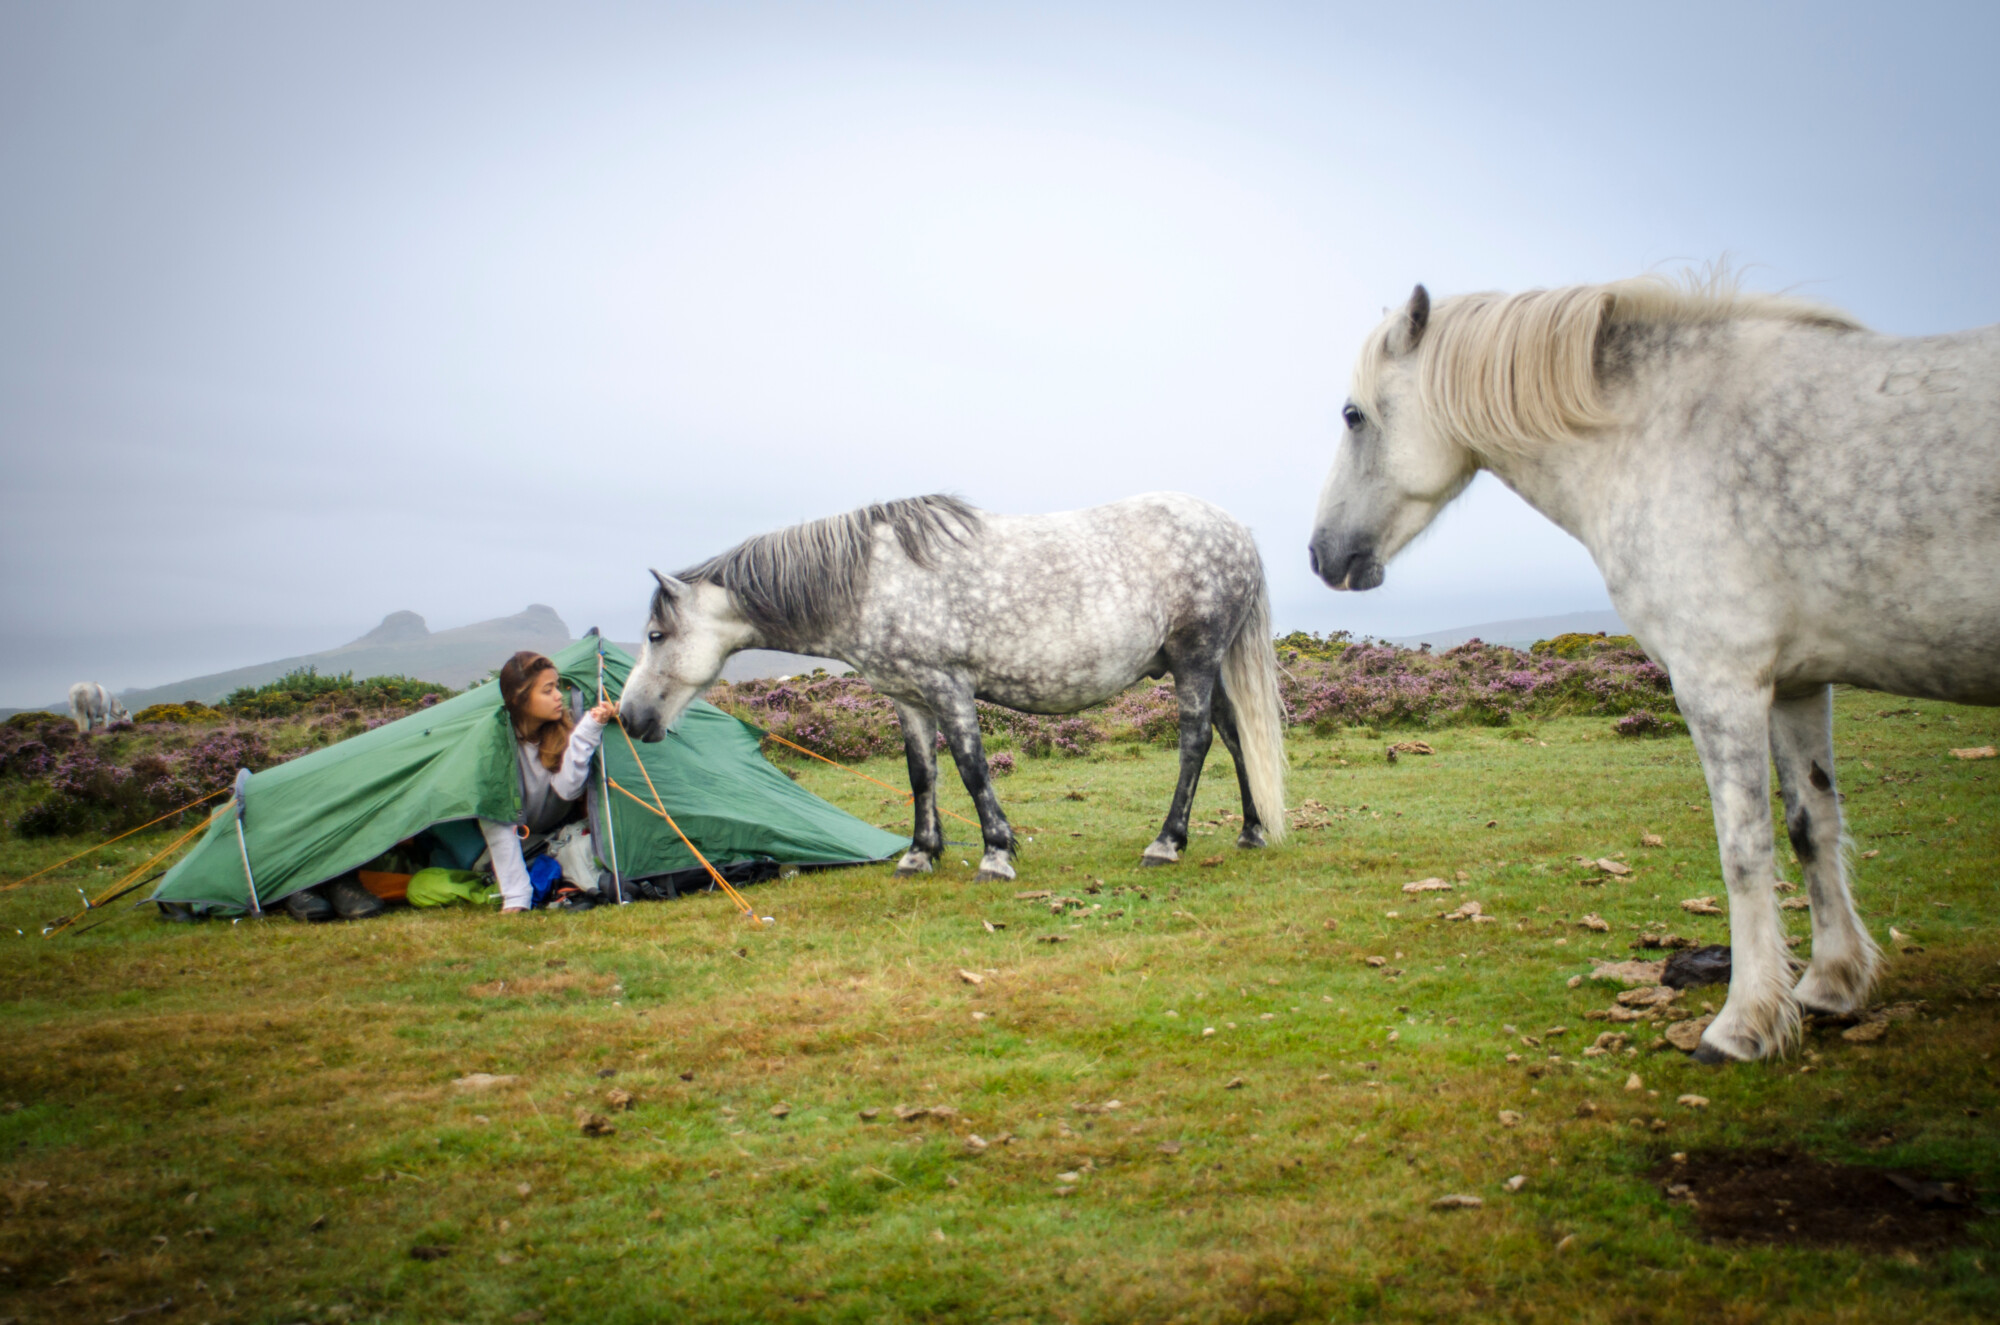 farm diversification - Wild Dartmoor ponies visiting female wild camper in her tent, Devon, UK